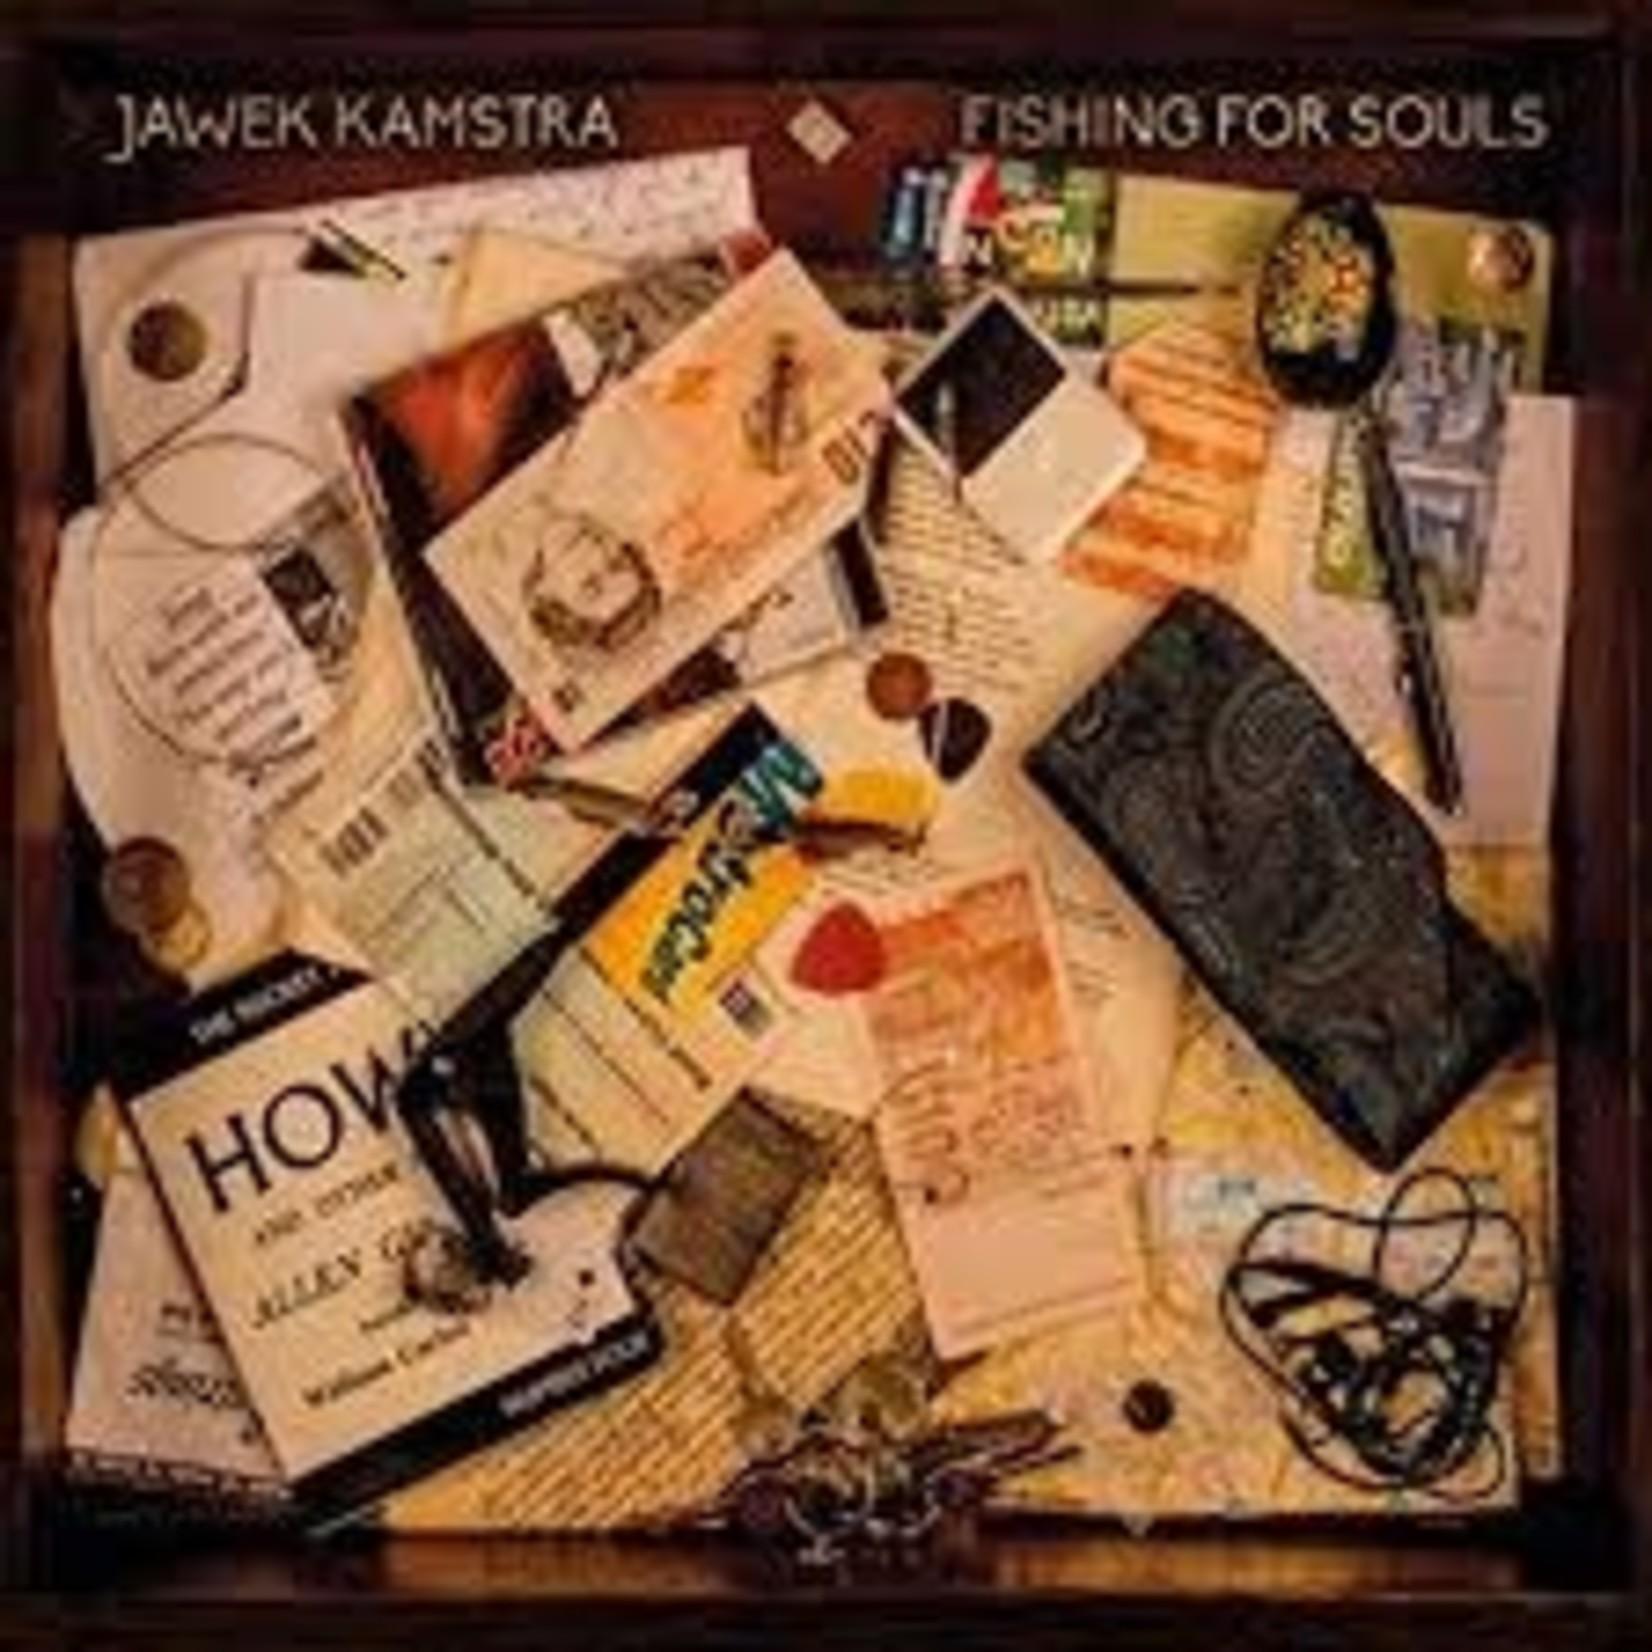 Jawek Kamstra - Fishing For Souls  (CD)